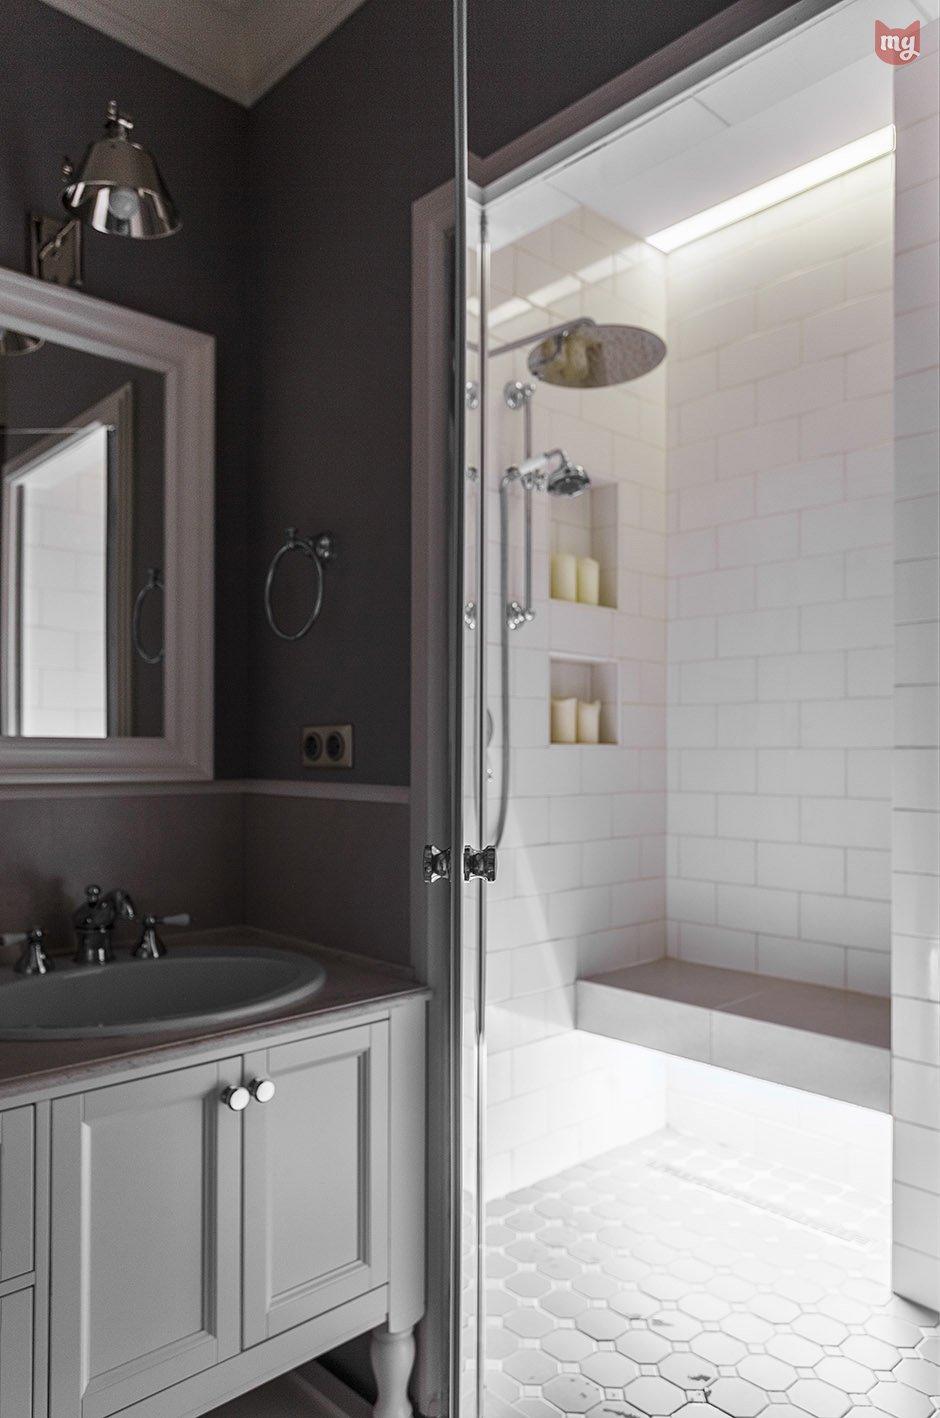 Фотография: Ванная в стиле Прованс и Кантри, Квартира, Проект недели, Наталья Сорокина – фото на INMYROOM